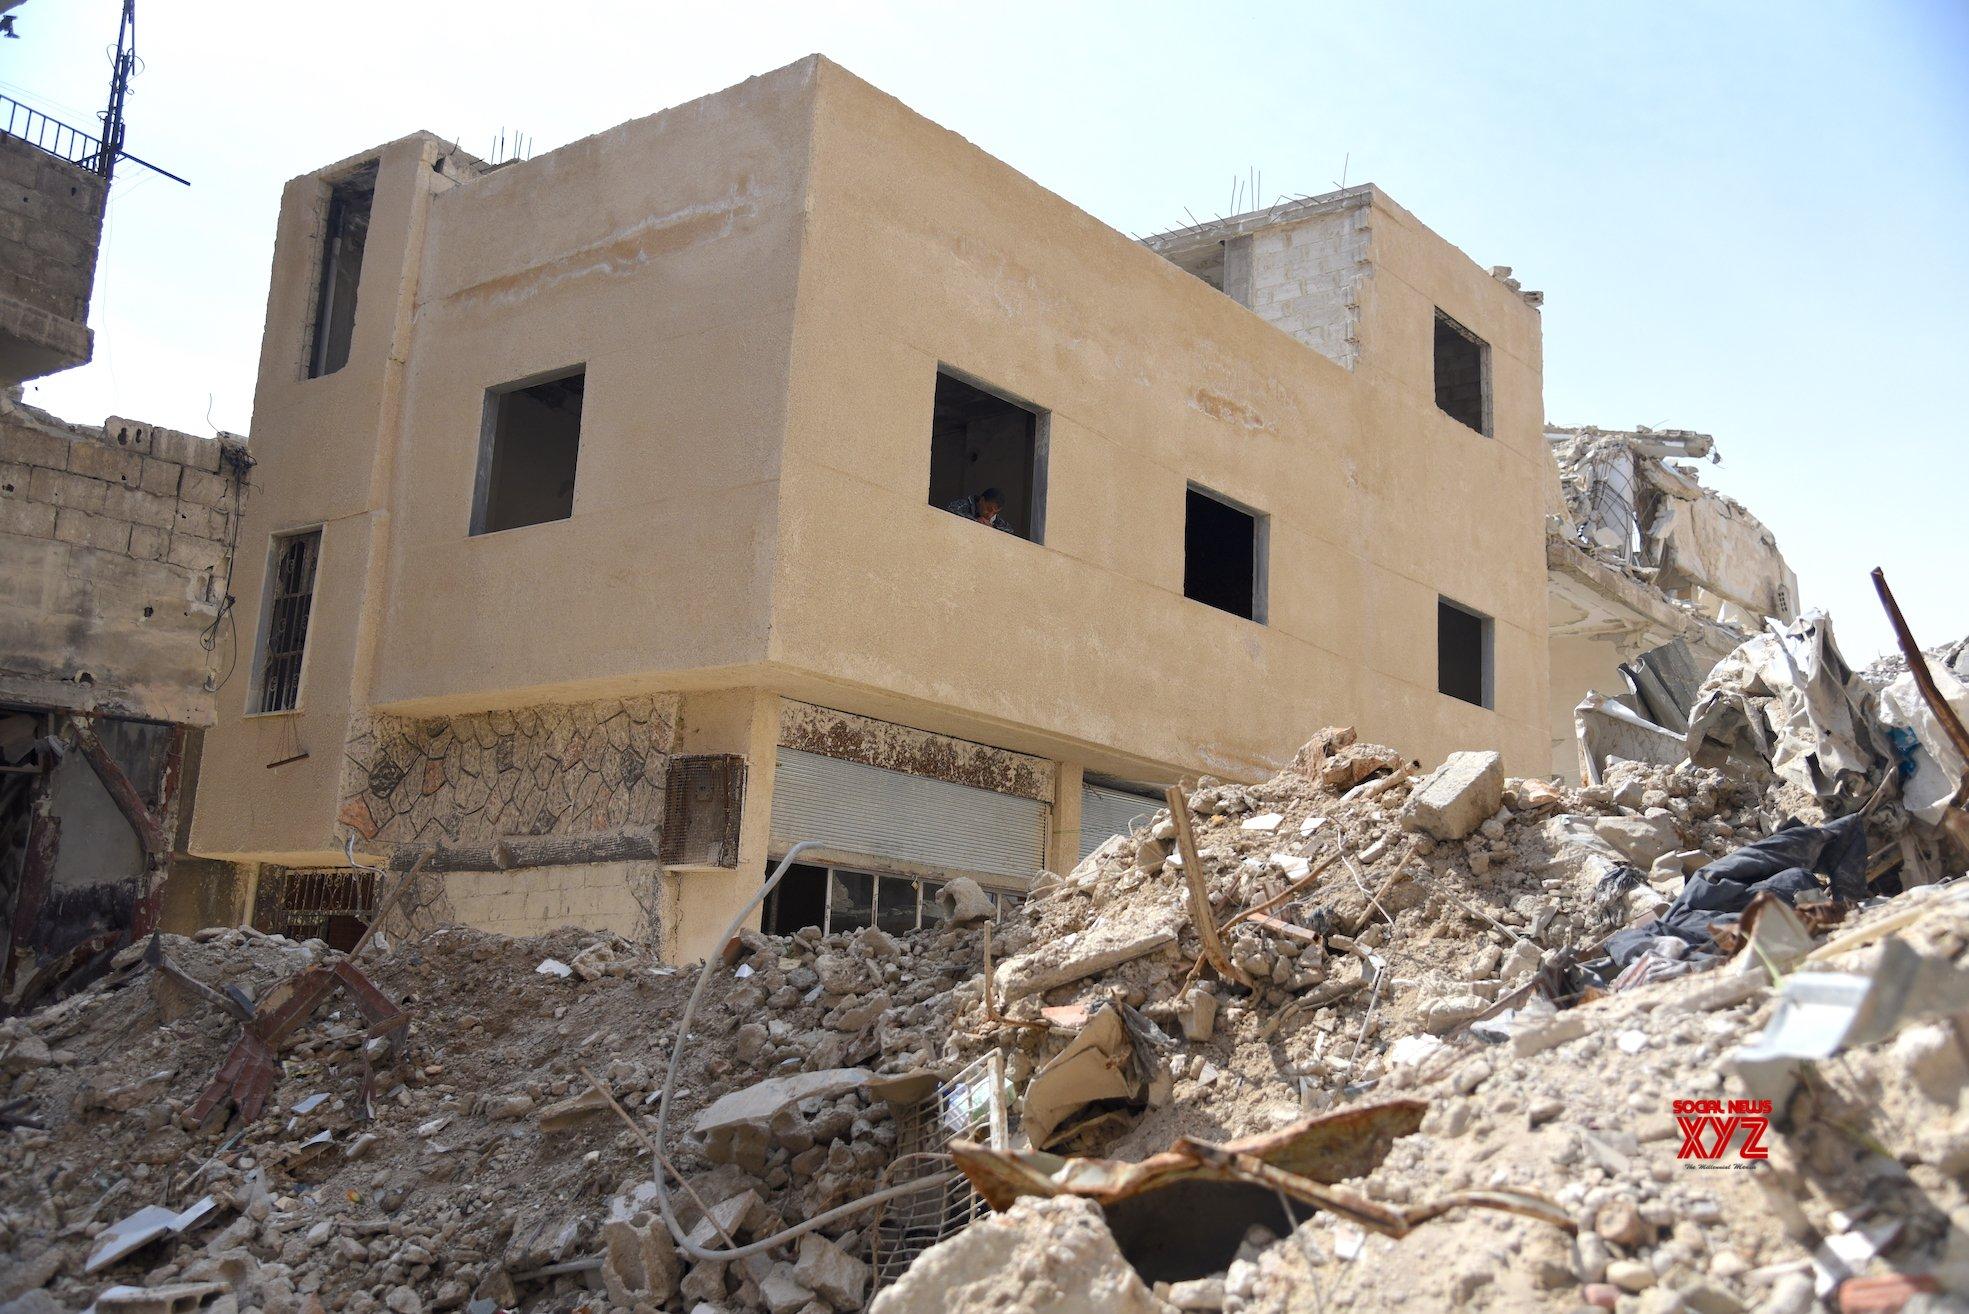 SYRIA - DAMASCUS - EASTERN GHOUTA - REBUILDING #Gallery